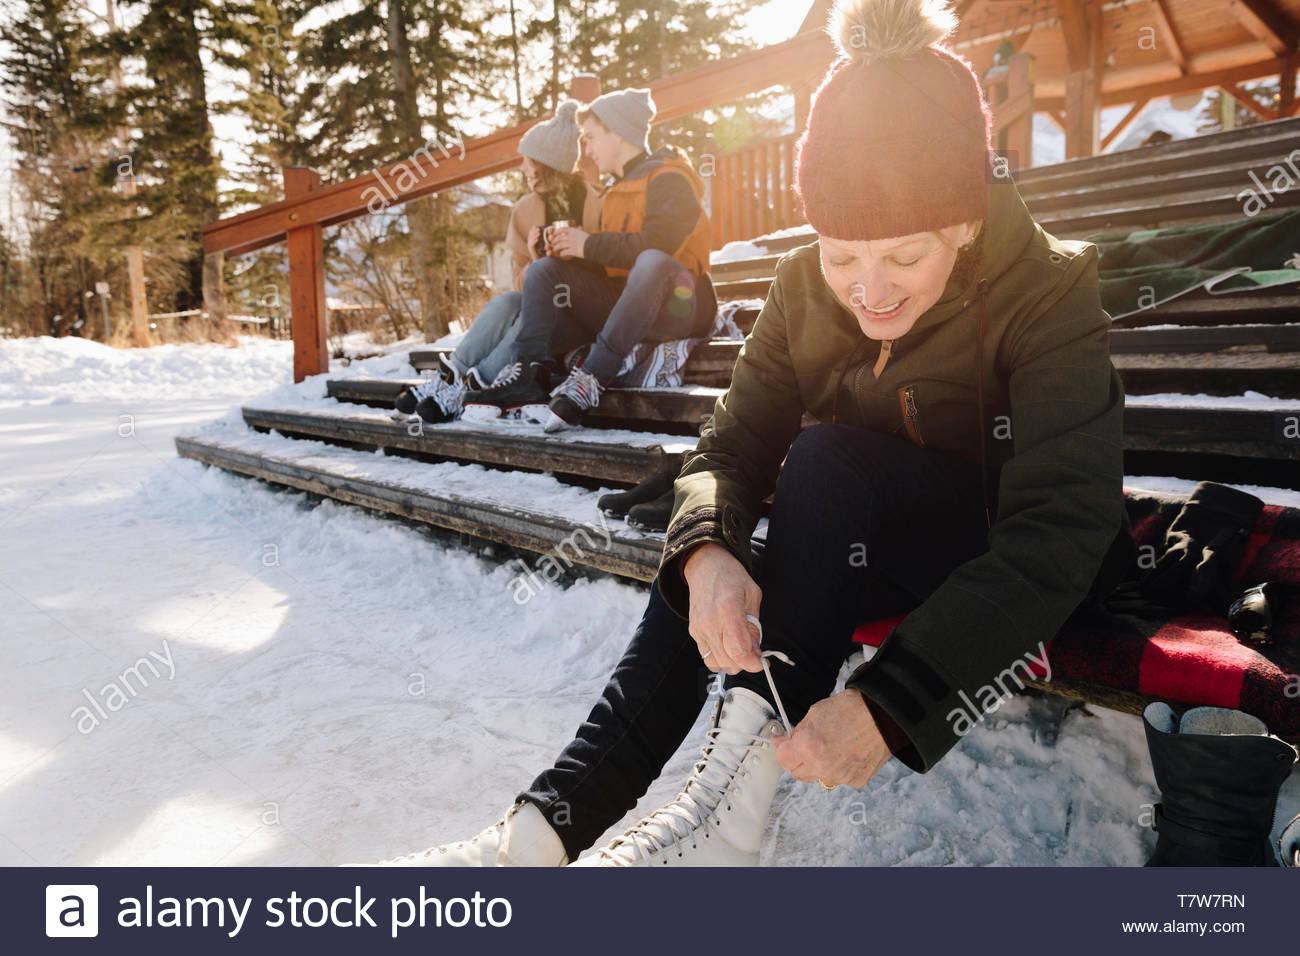 Smiling senior woman tying ice skates on snowy steps - Stock Image